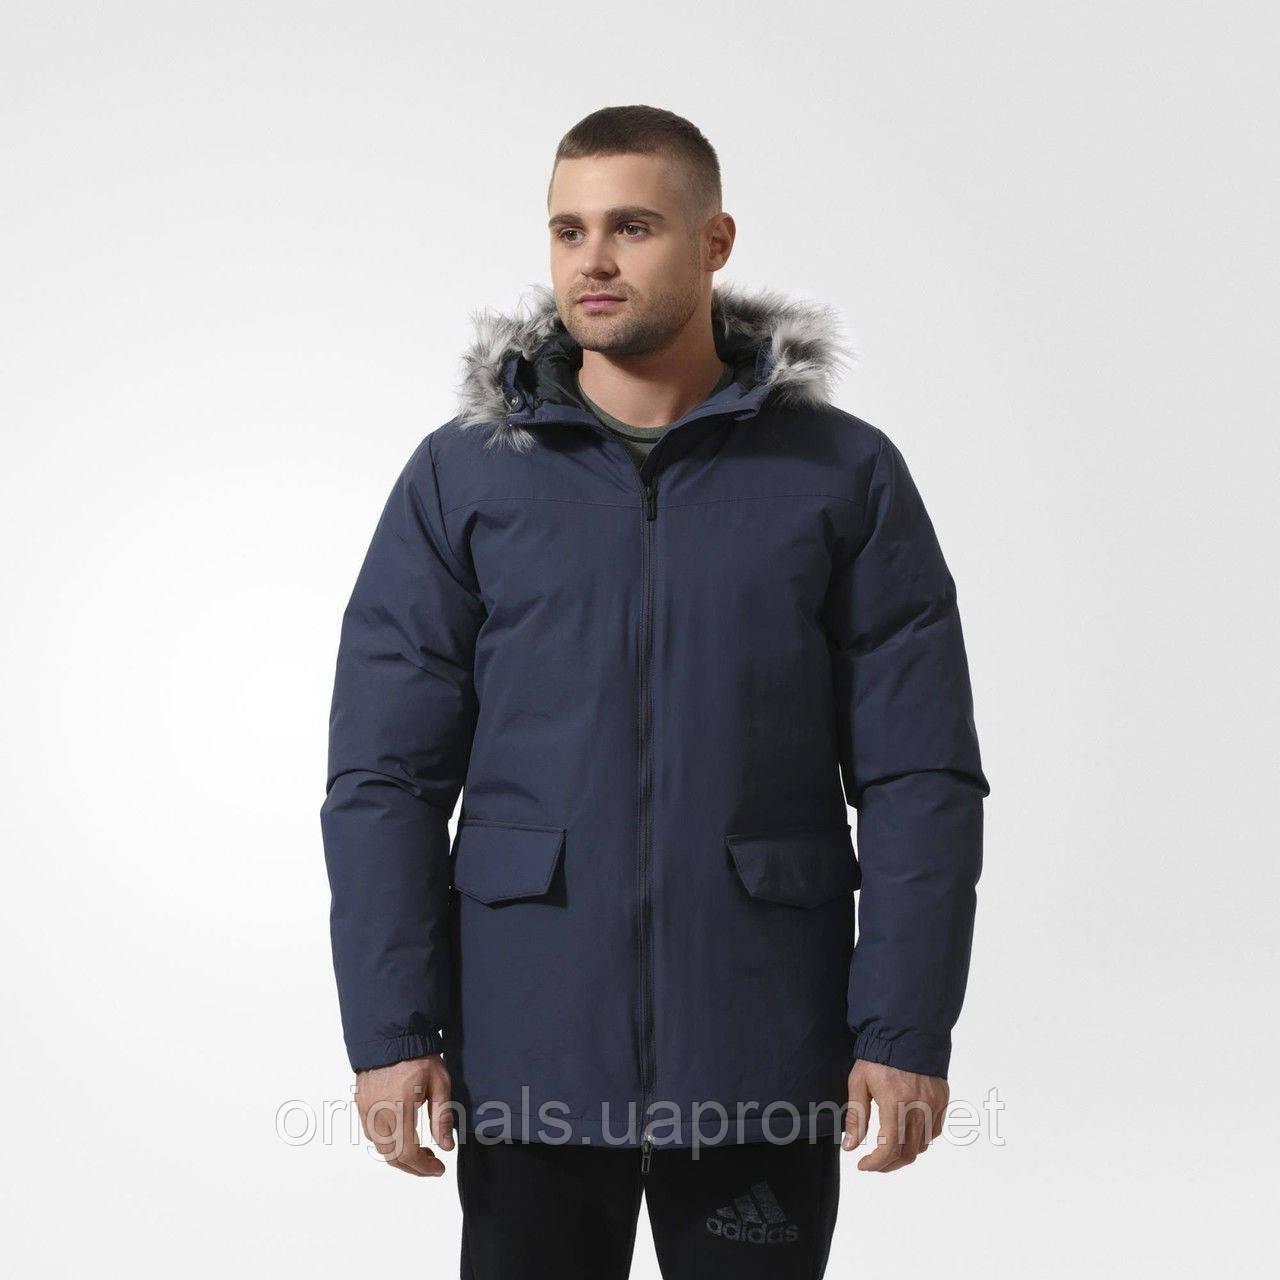 Куртка мужская Adidas SDPJKT LONG FUR AA1366 зима